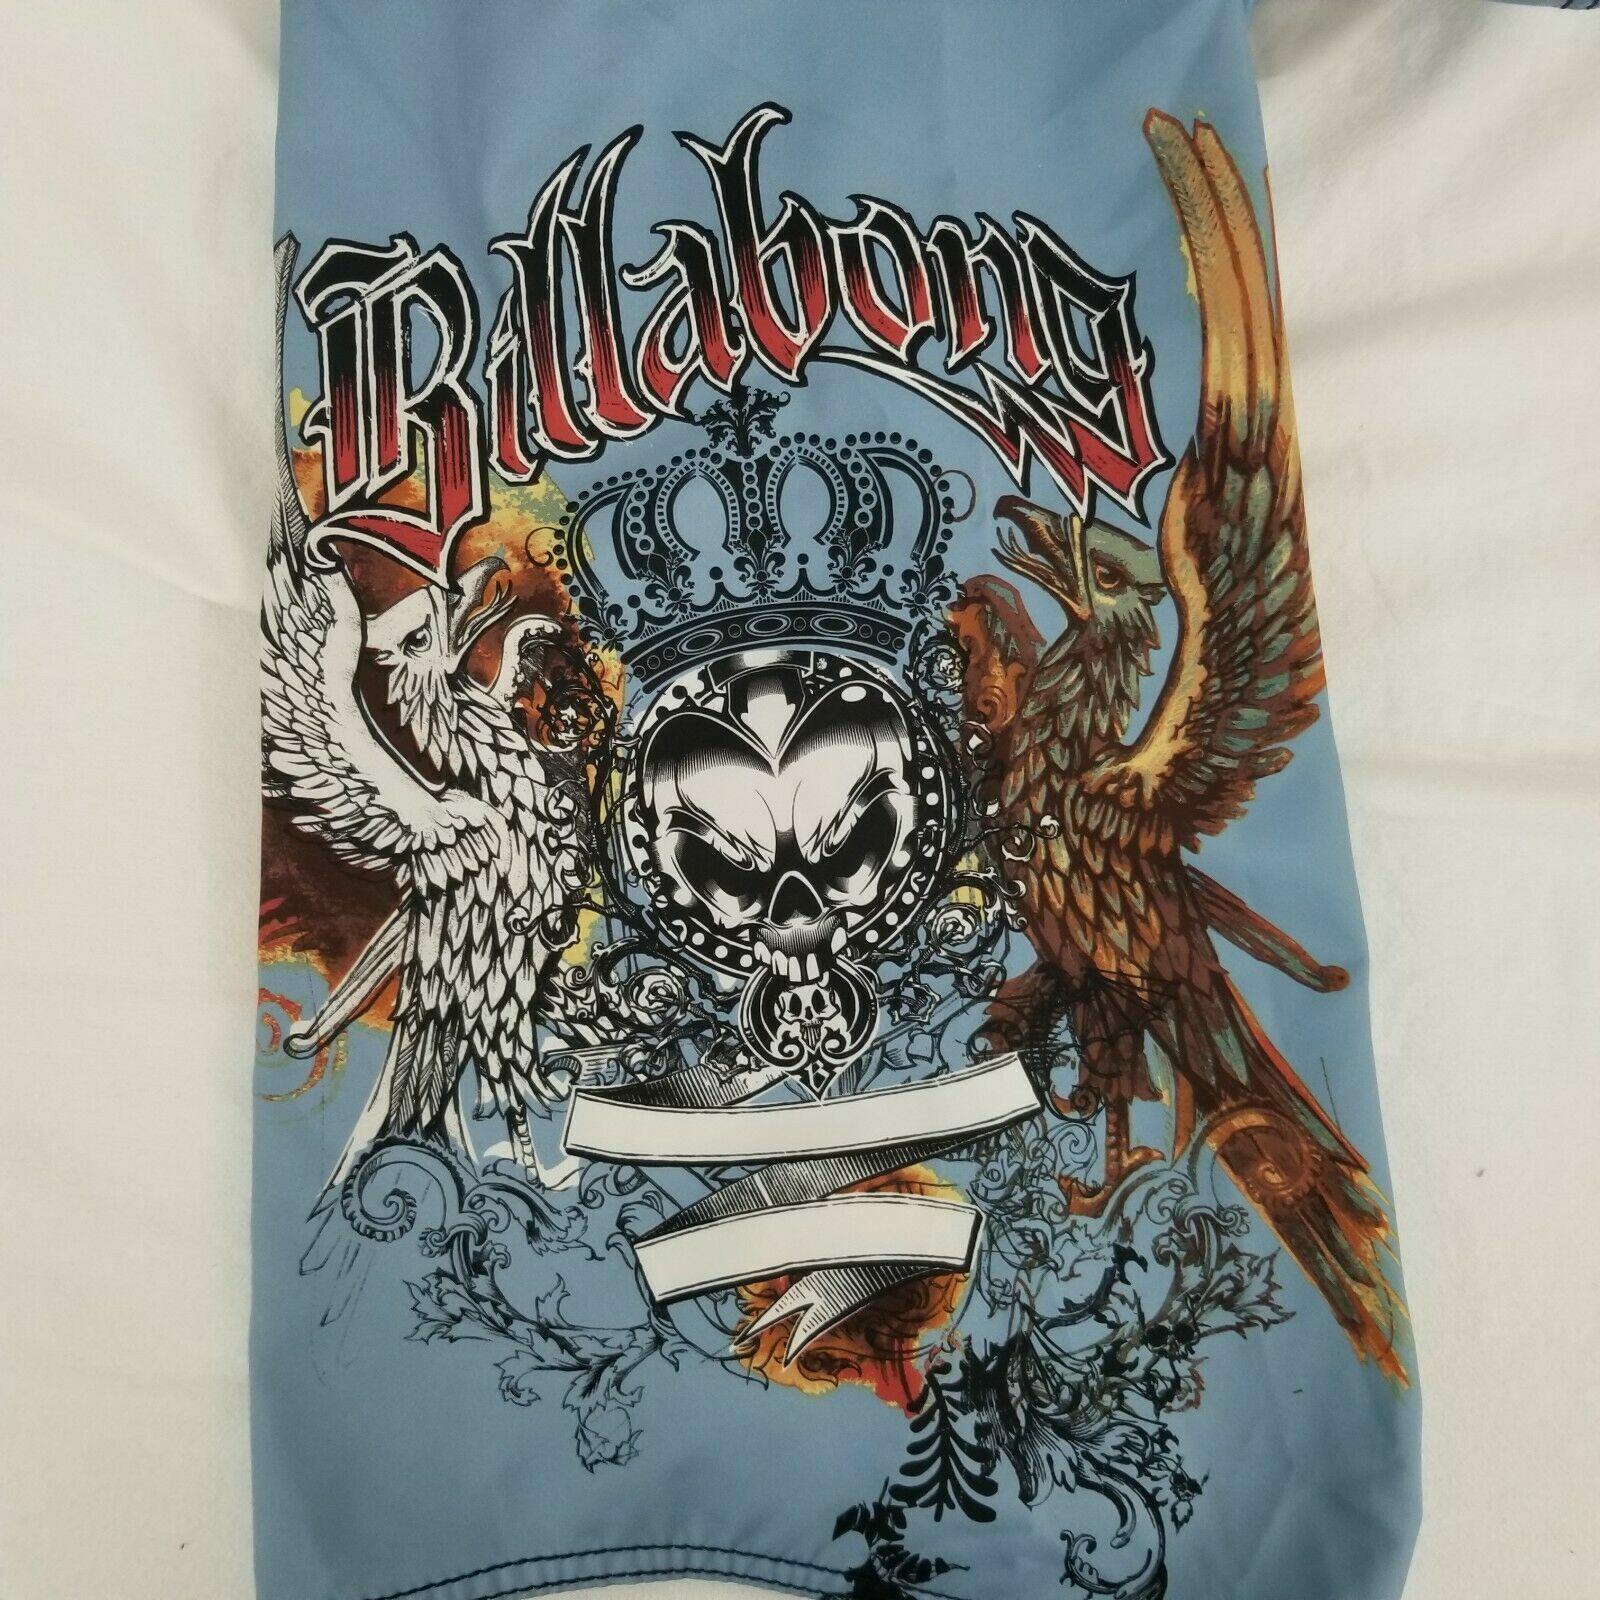 Men's BILLABONG Board Shorts Swim Trunks bluee & White w  Tattoo Design (Size 32)